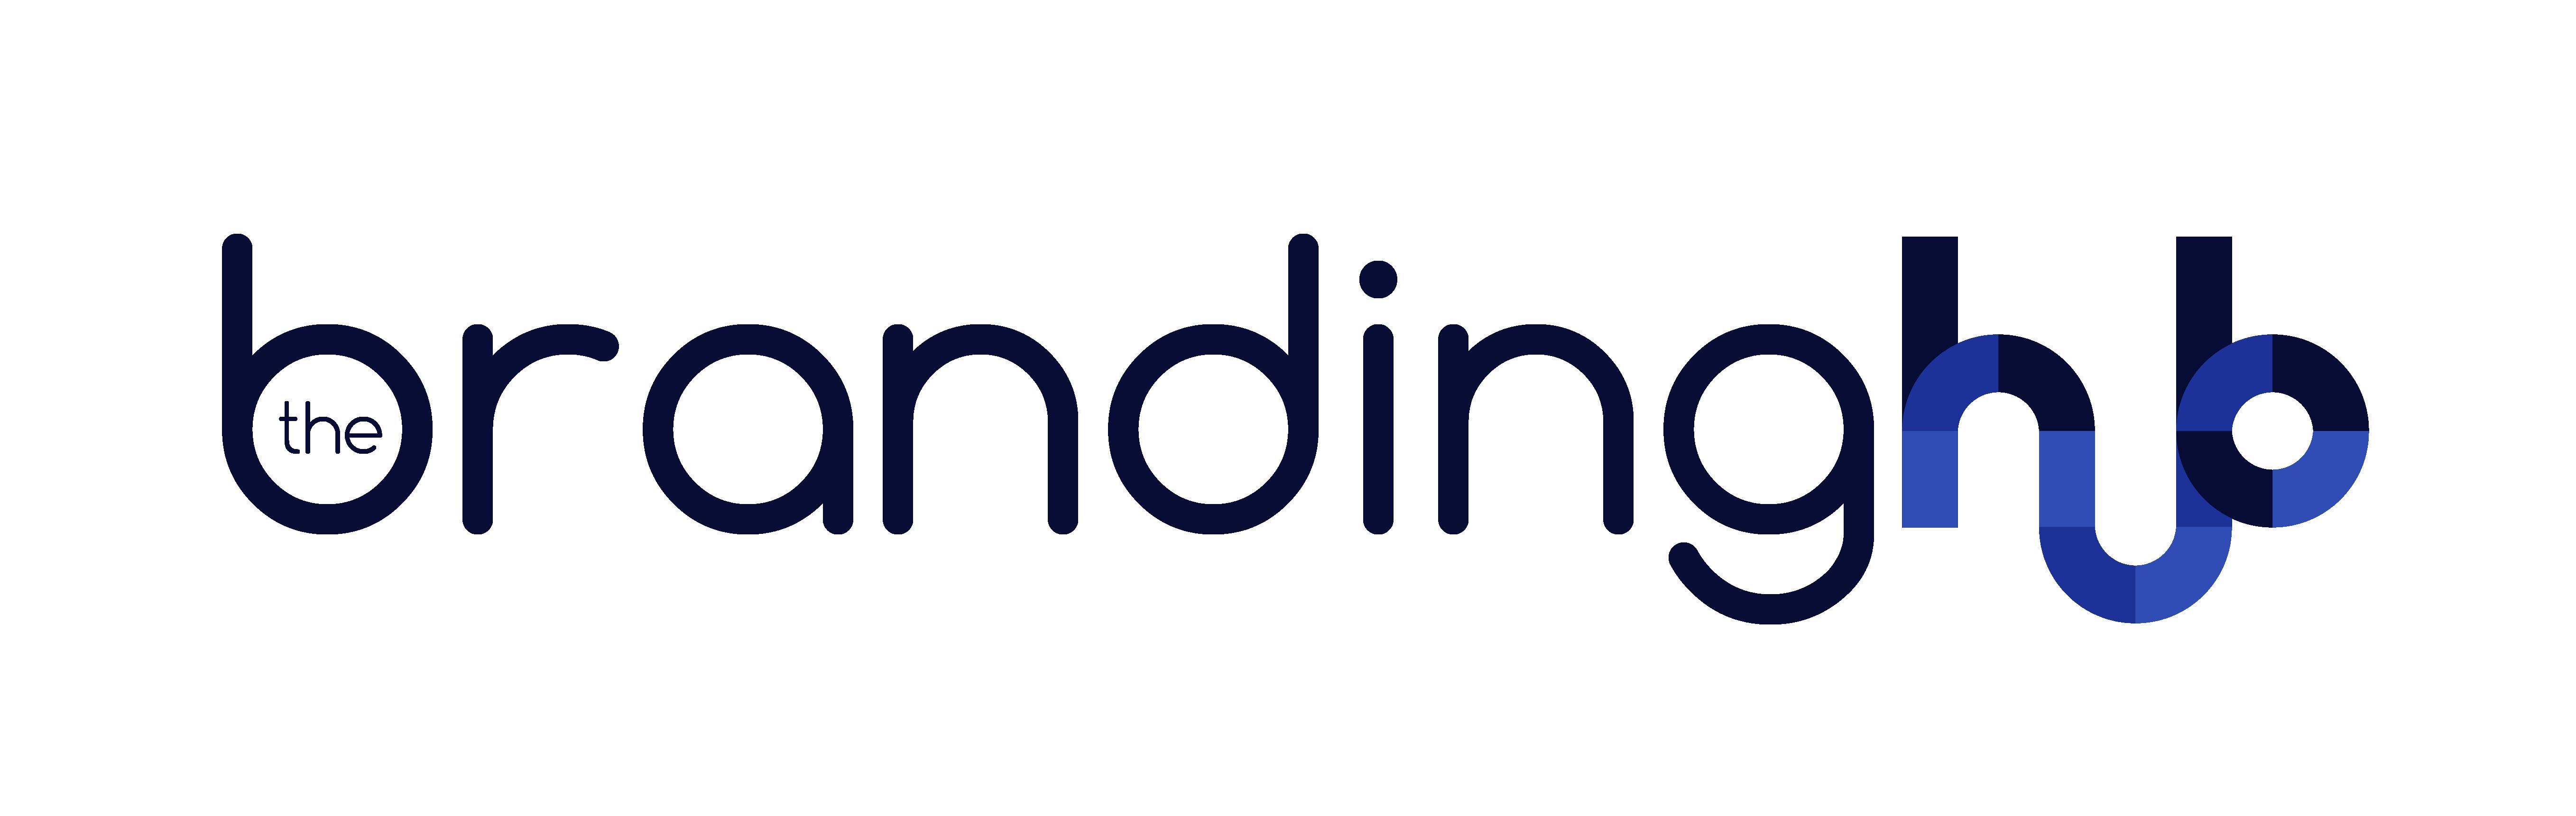 The Branding Hub